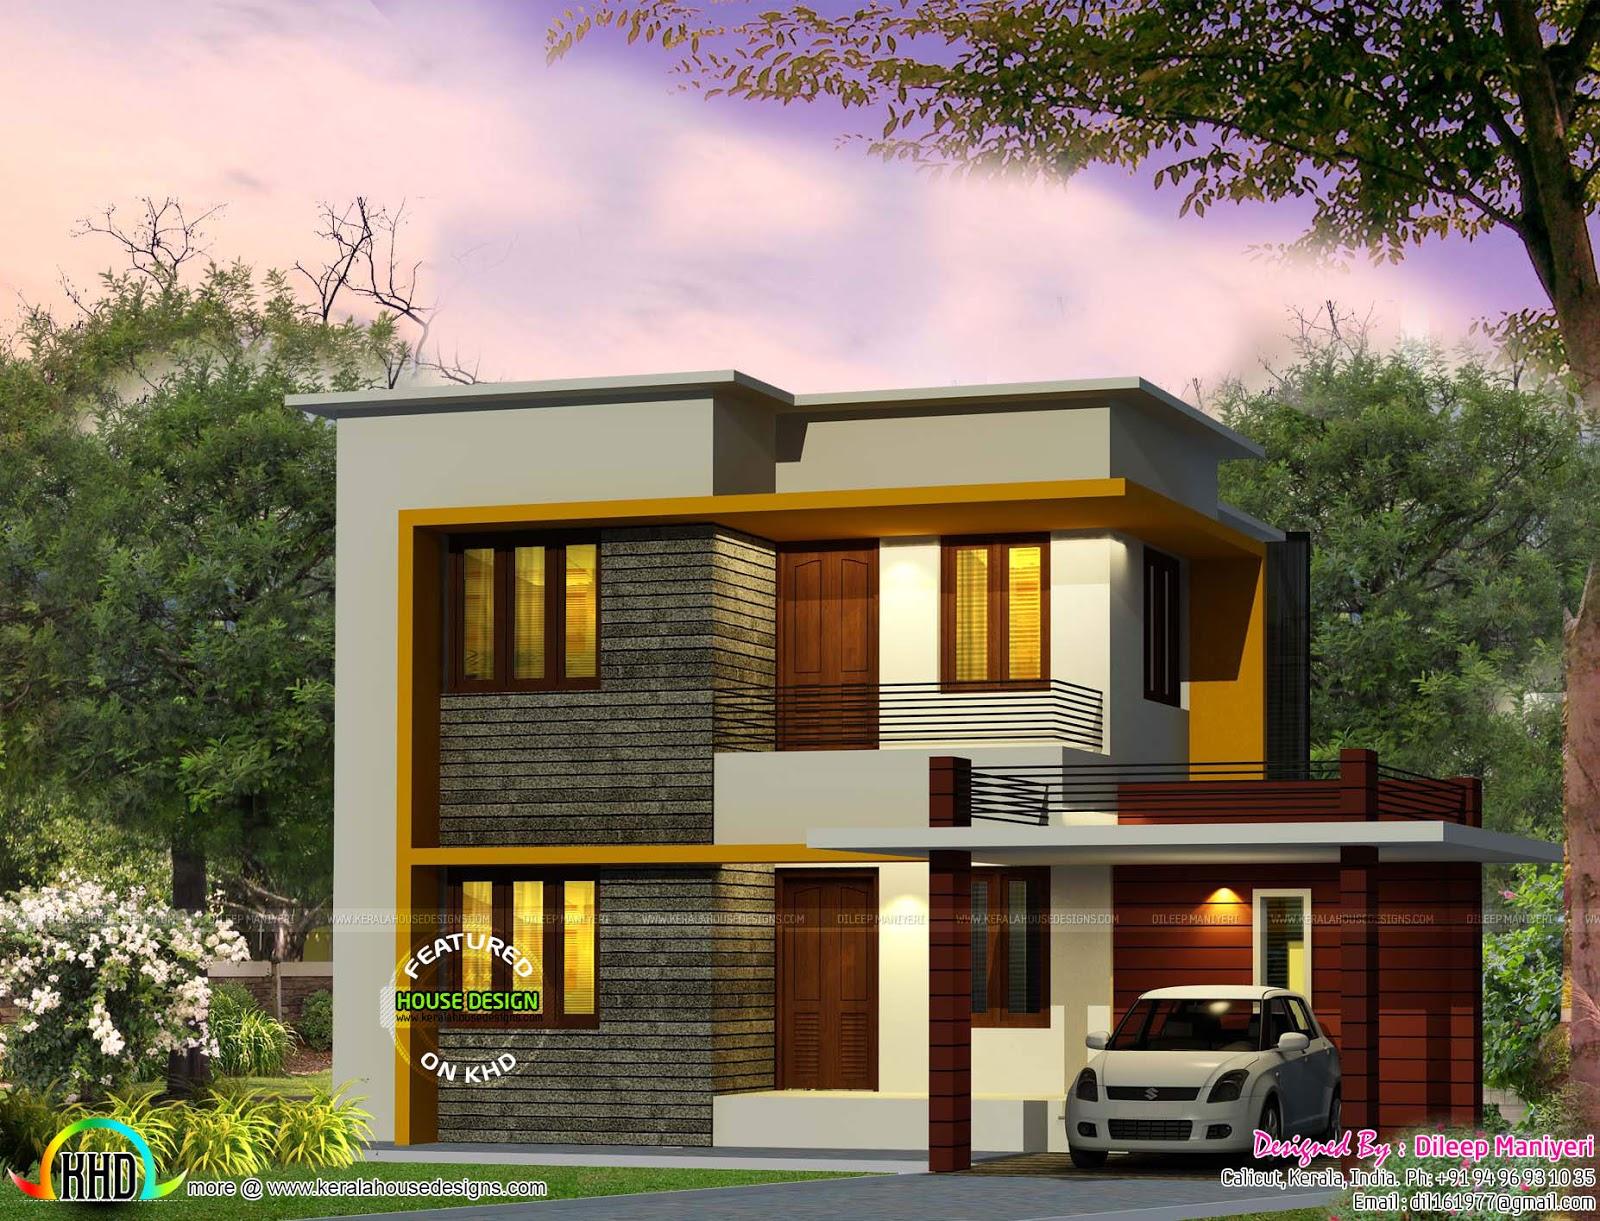 Cute 4 bedroom modern house 1670 sqft  Kerala home design  Bloglovin